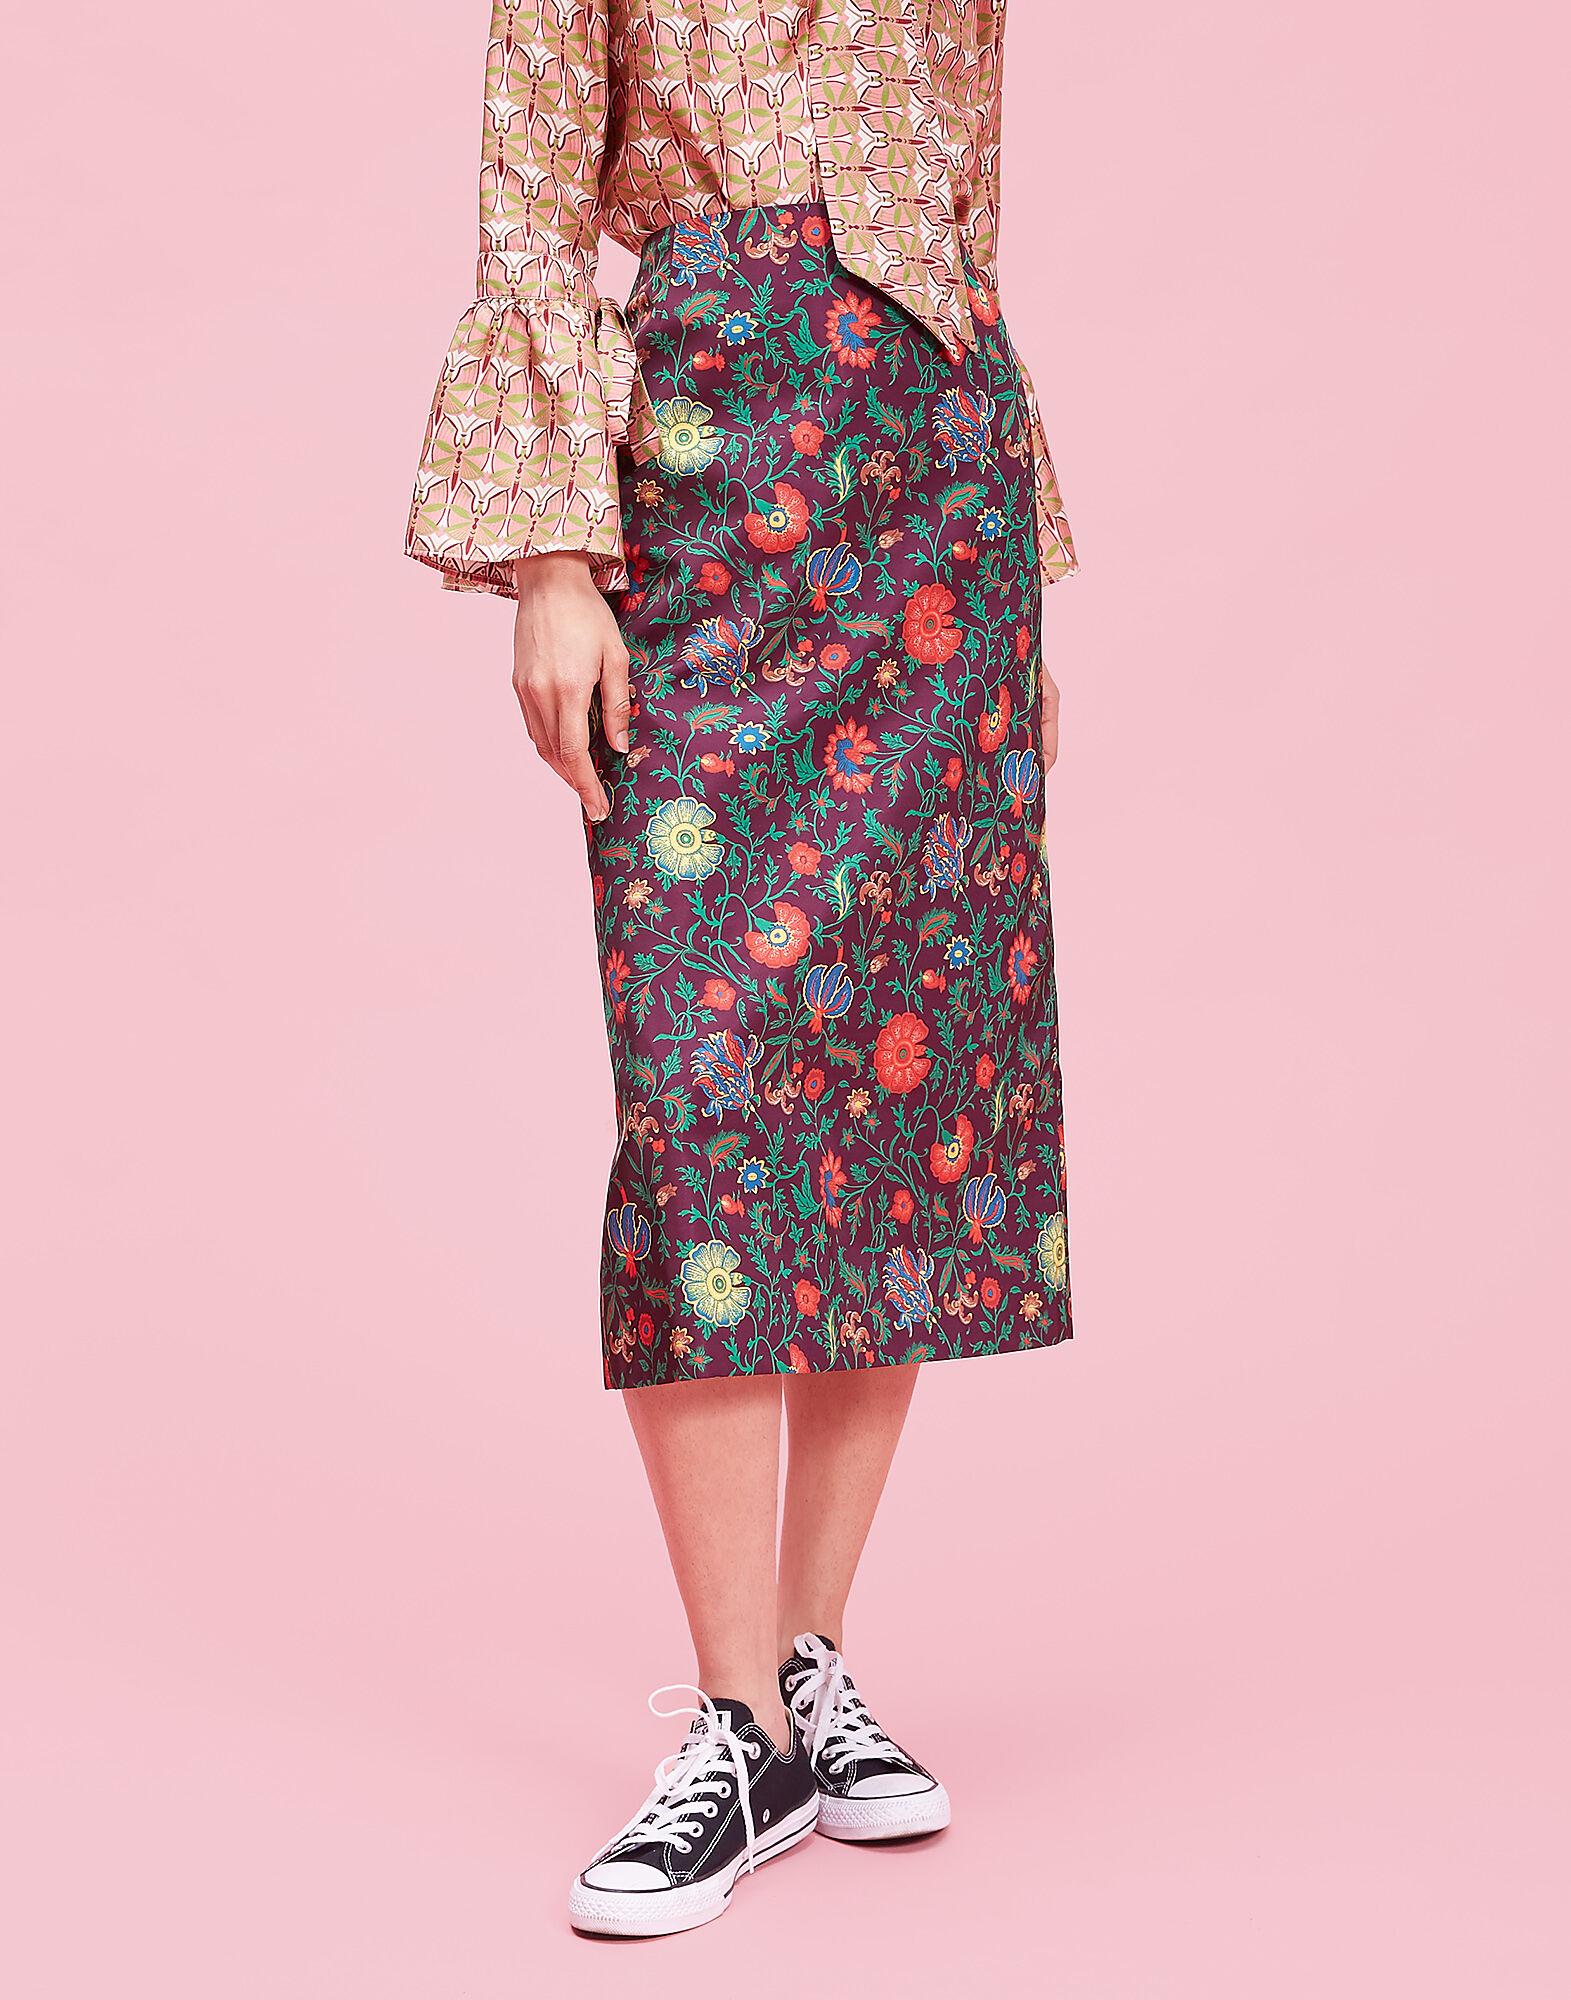 La Doublej Ldj Editions Clothing Skirts La Doublej Dragon